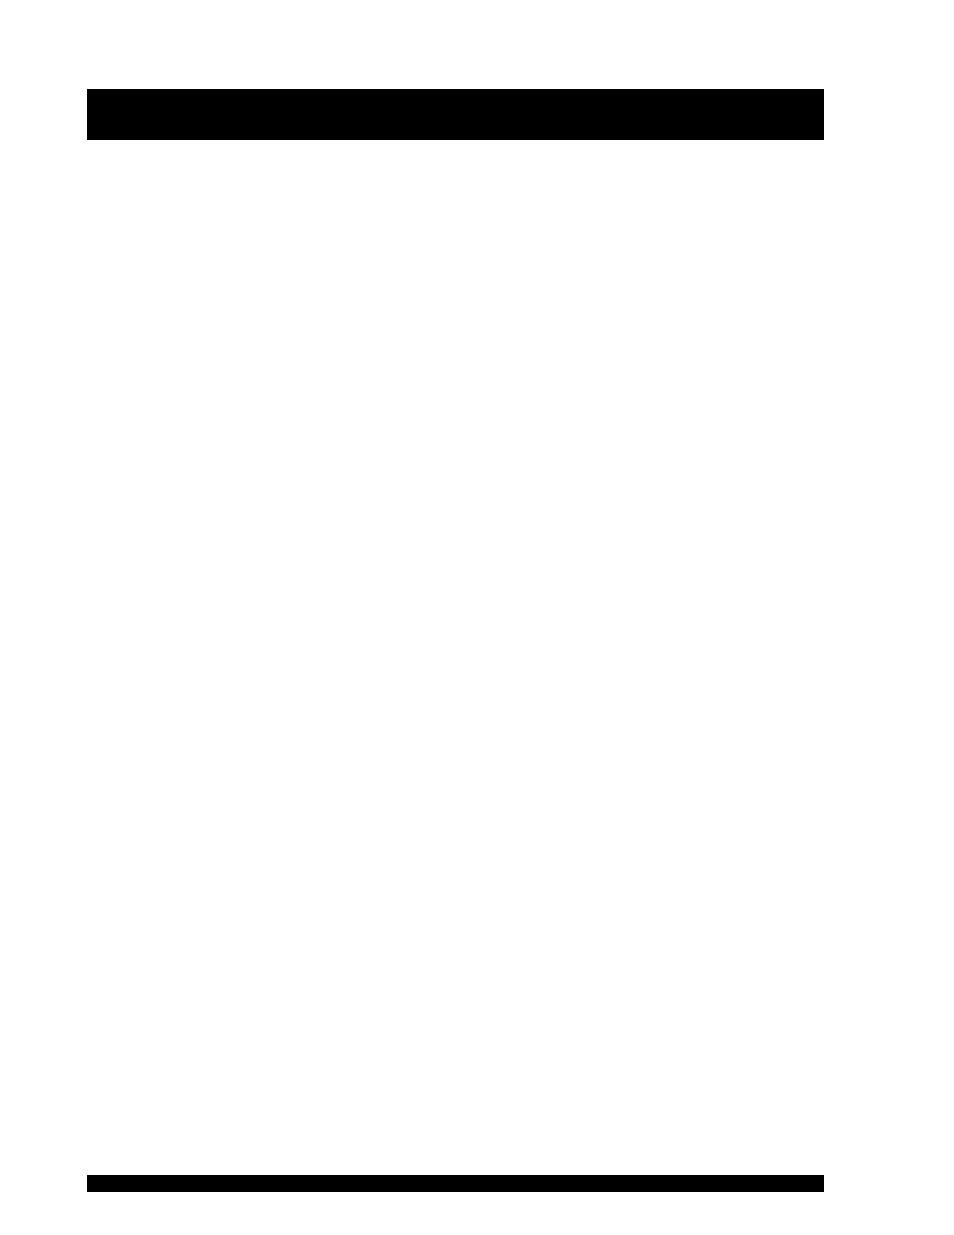 Appendix b   Brookfield RST Rheometer User Manual   Page 54 / 69